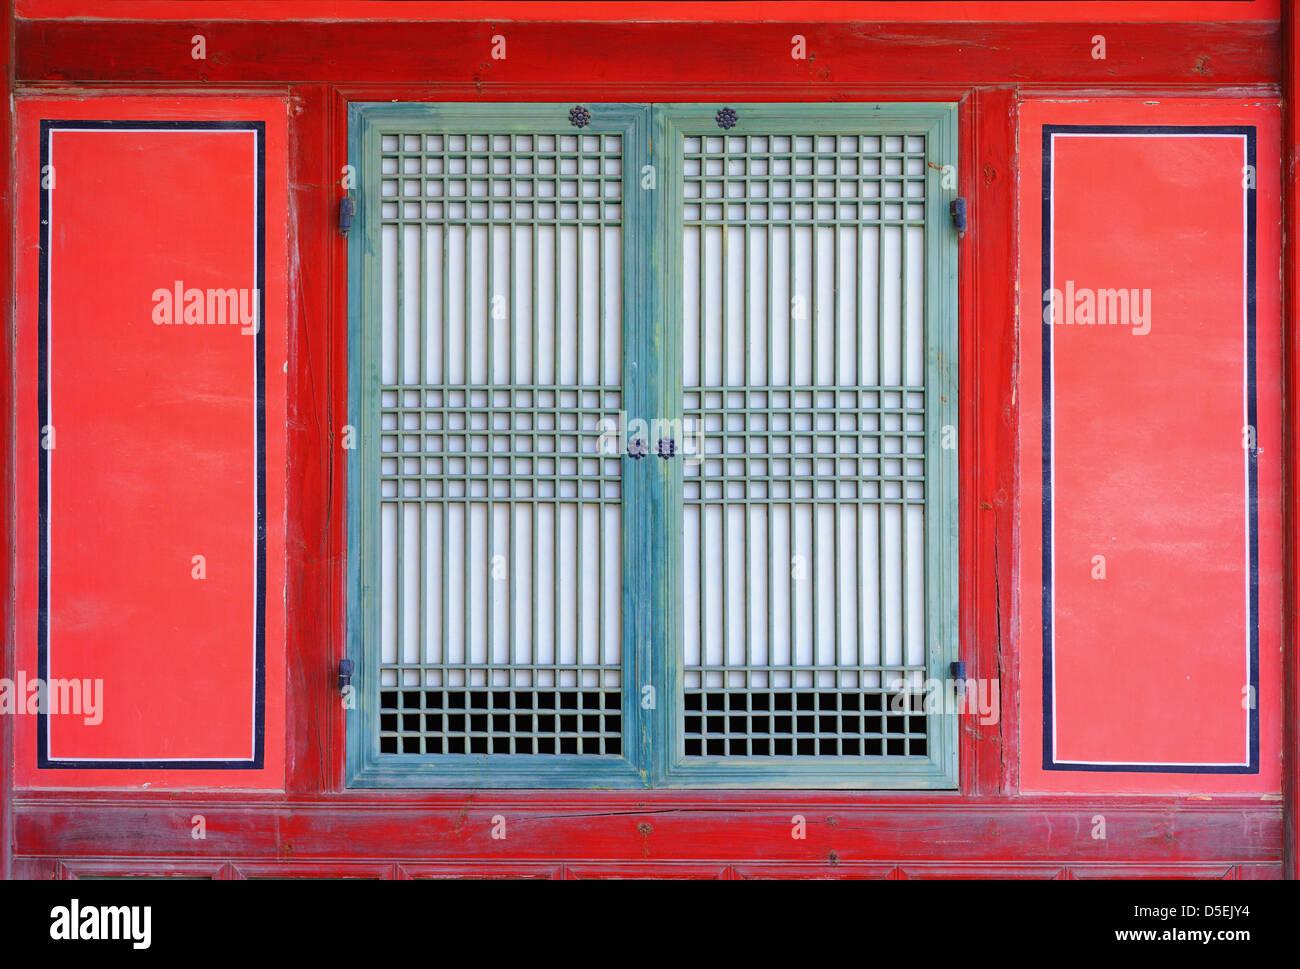 Fenster auf eine Gyeongbokgung Palast in Seoul, Korea. Stockbild